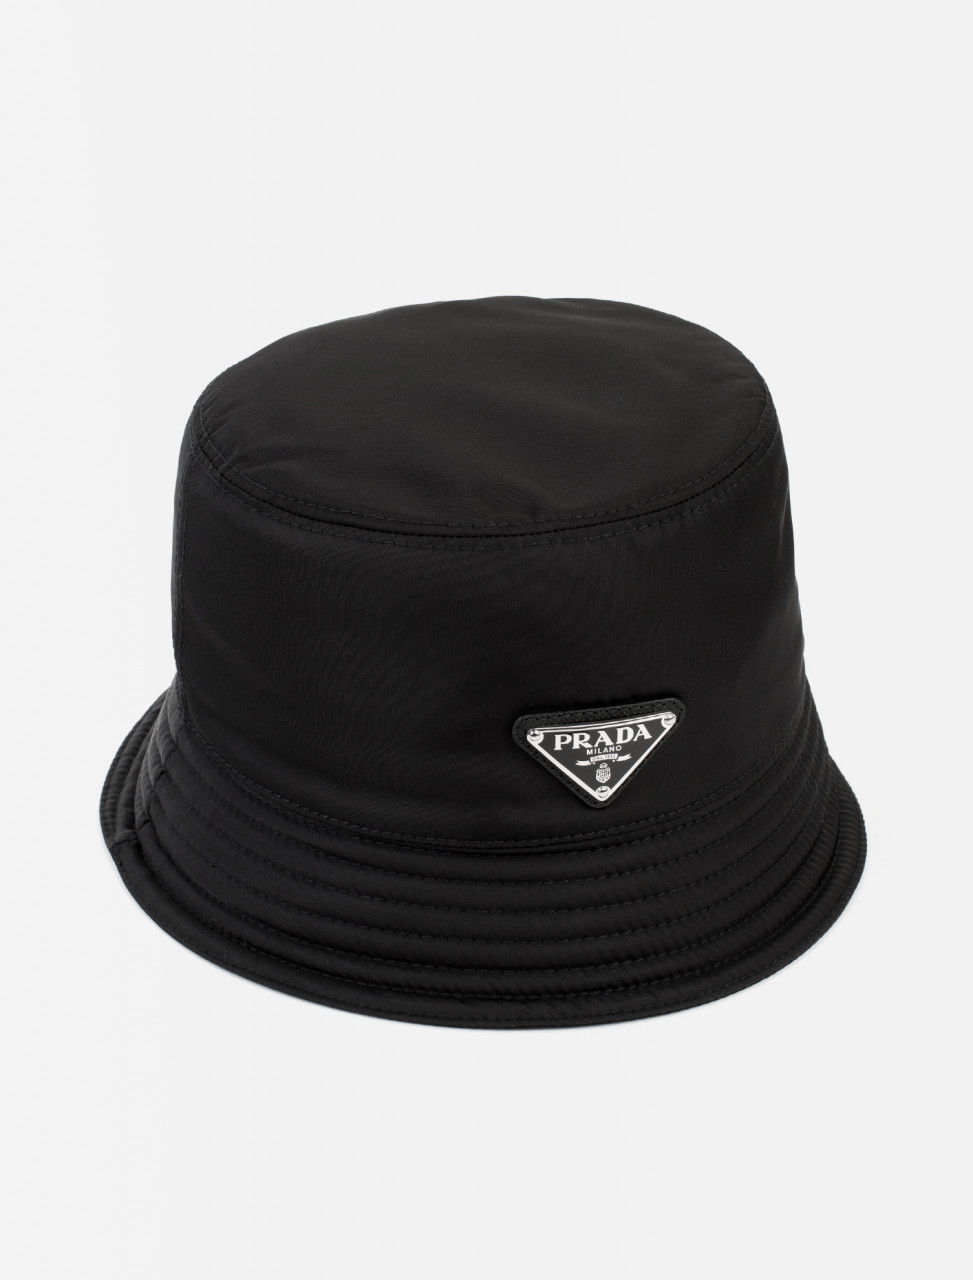 cfc128ba Prada Nylon Rain Hat | Voo Store Berlin | Worldwide Shipping